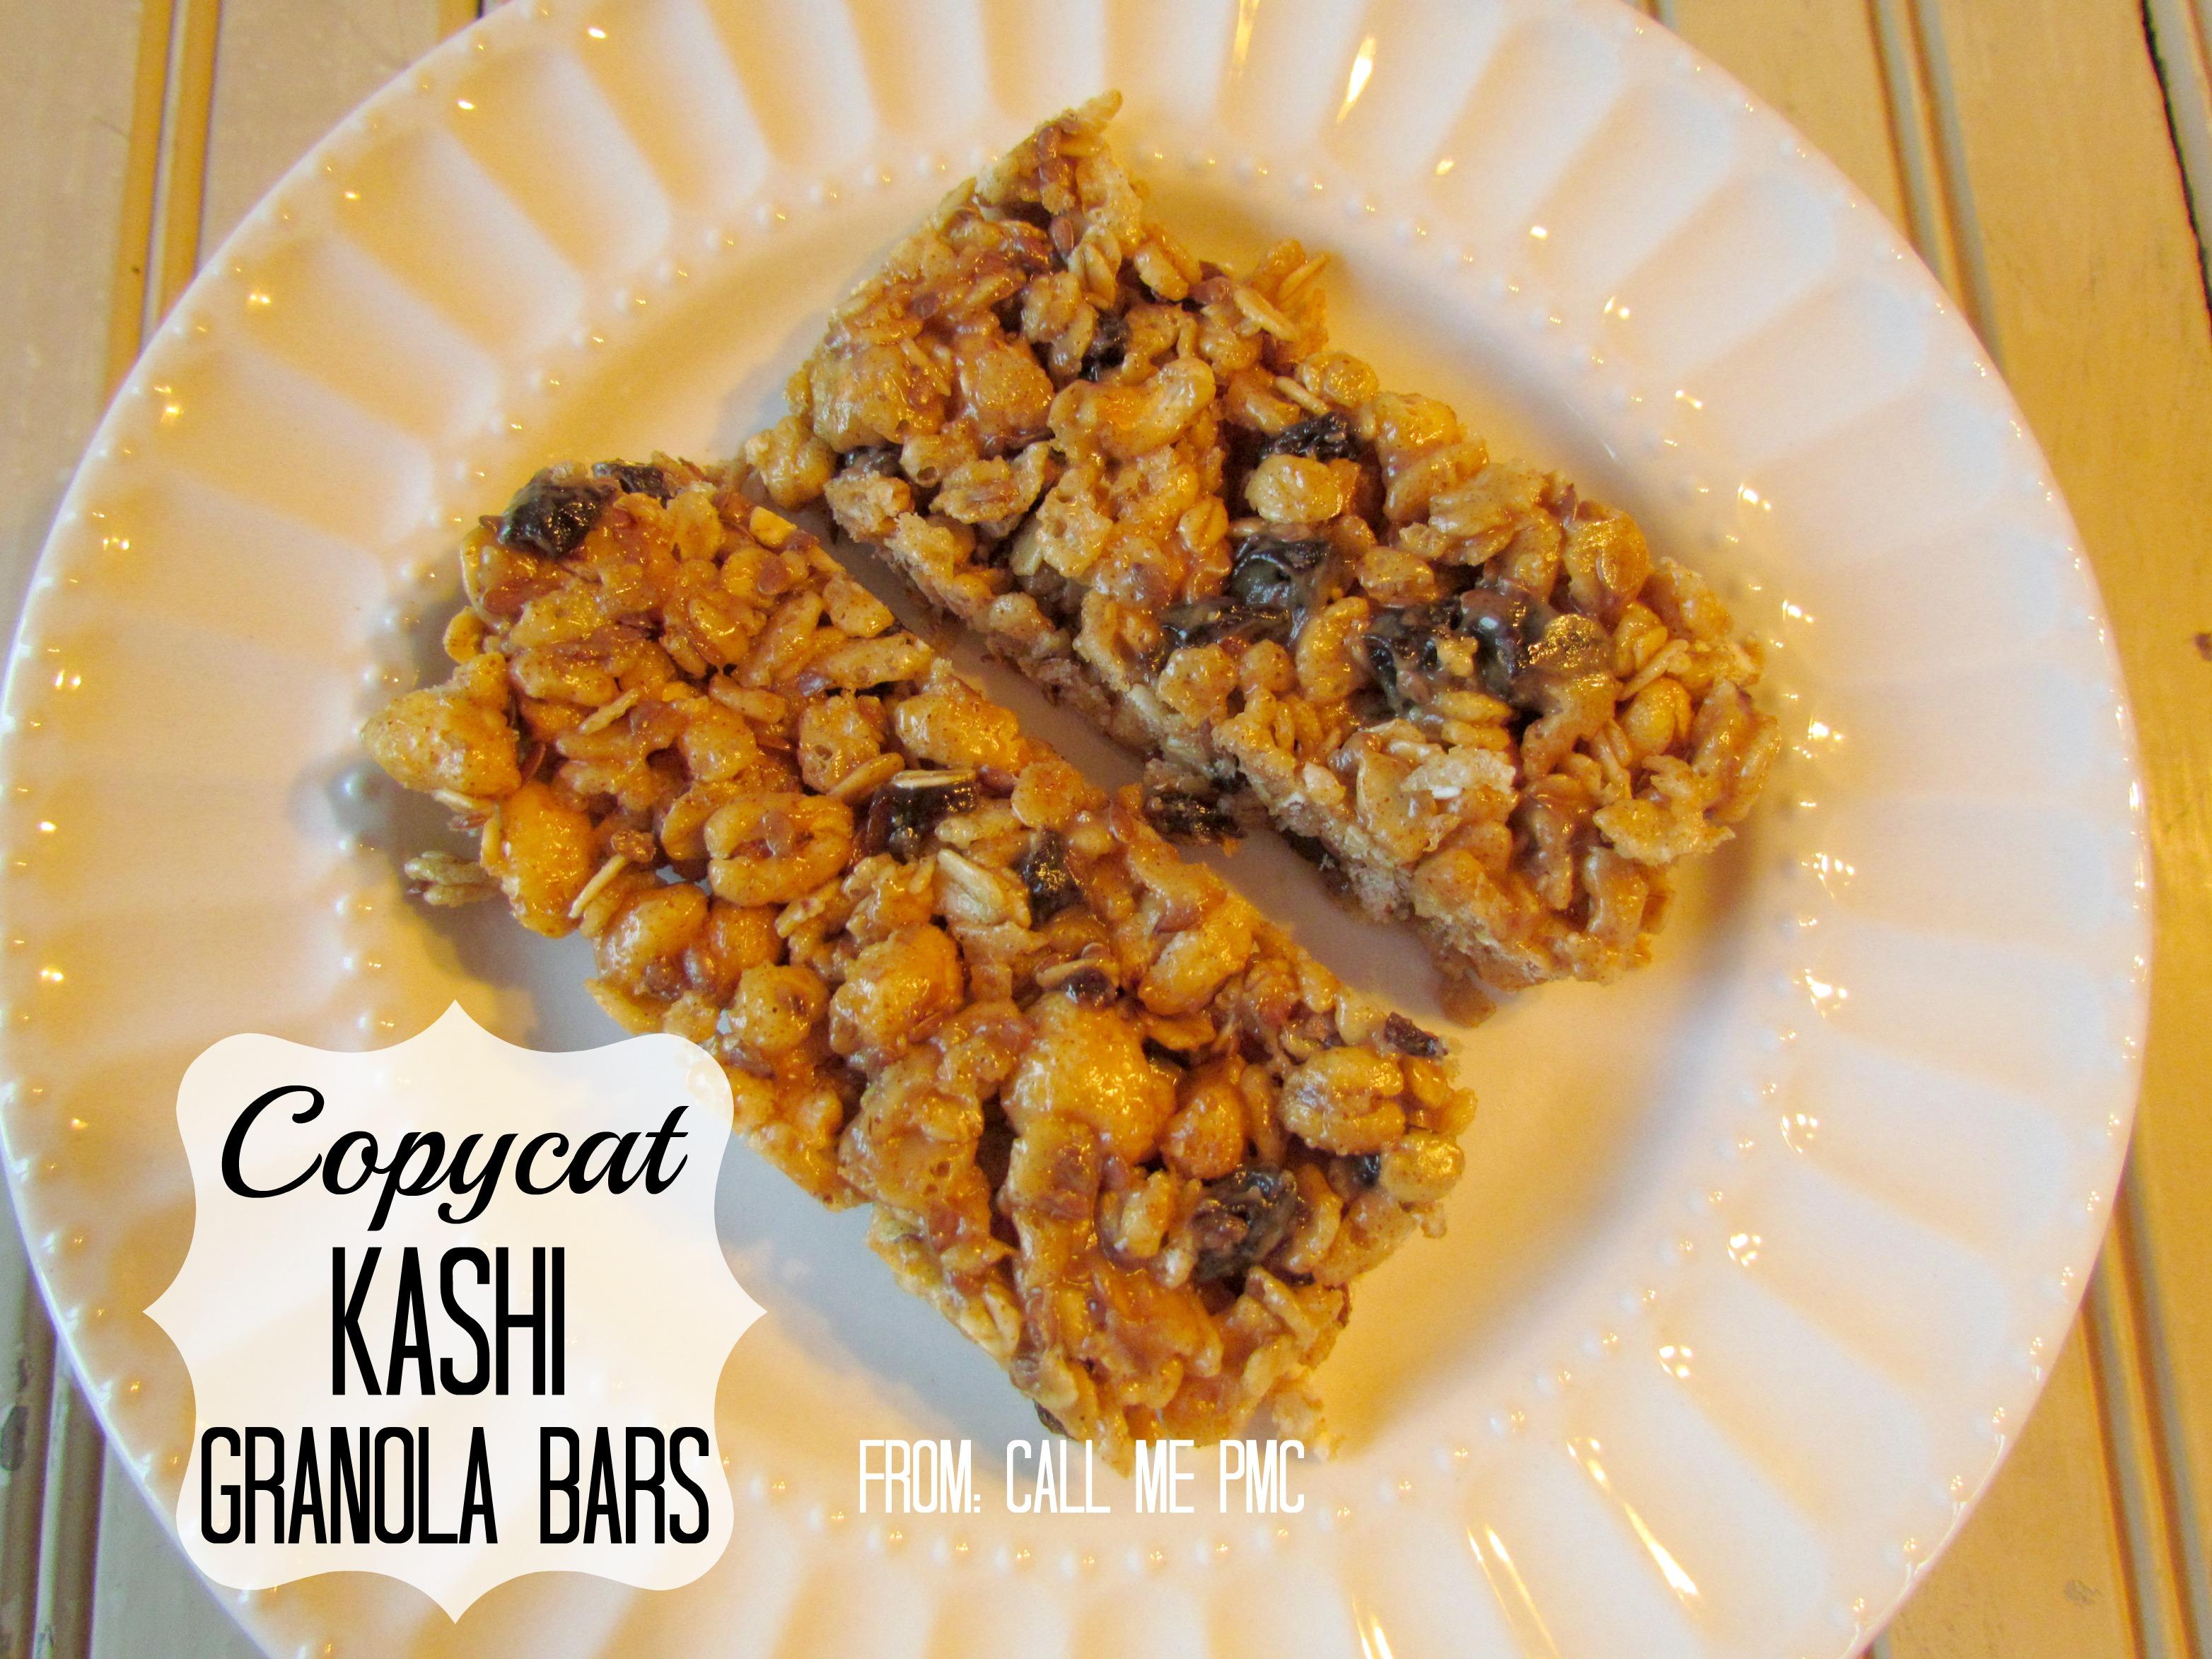 Copycat Kashi Granola Bar Recipe